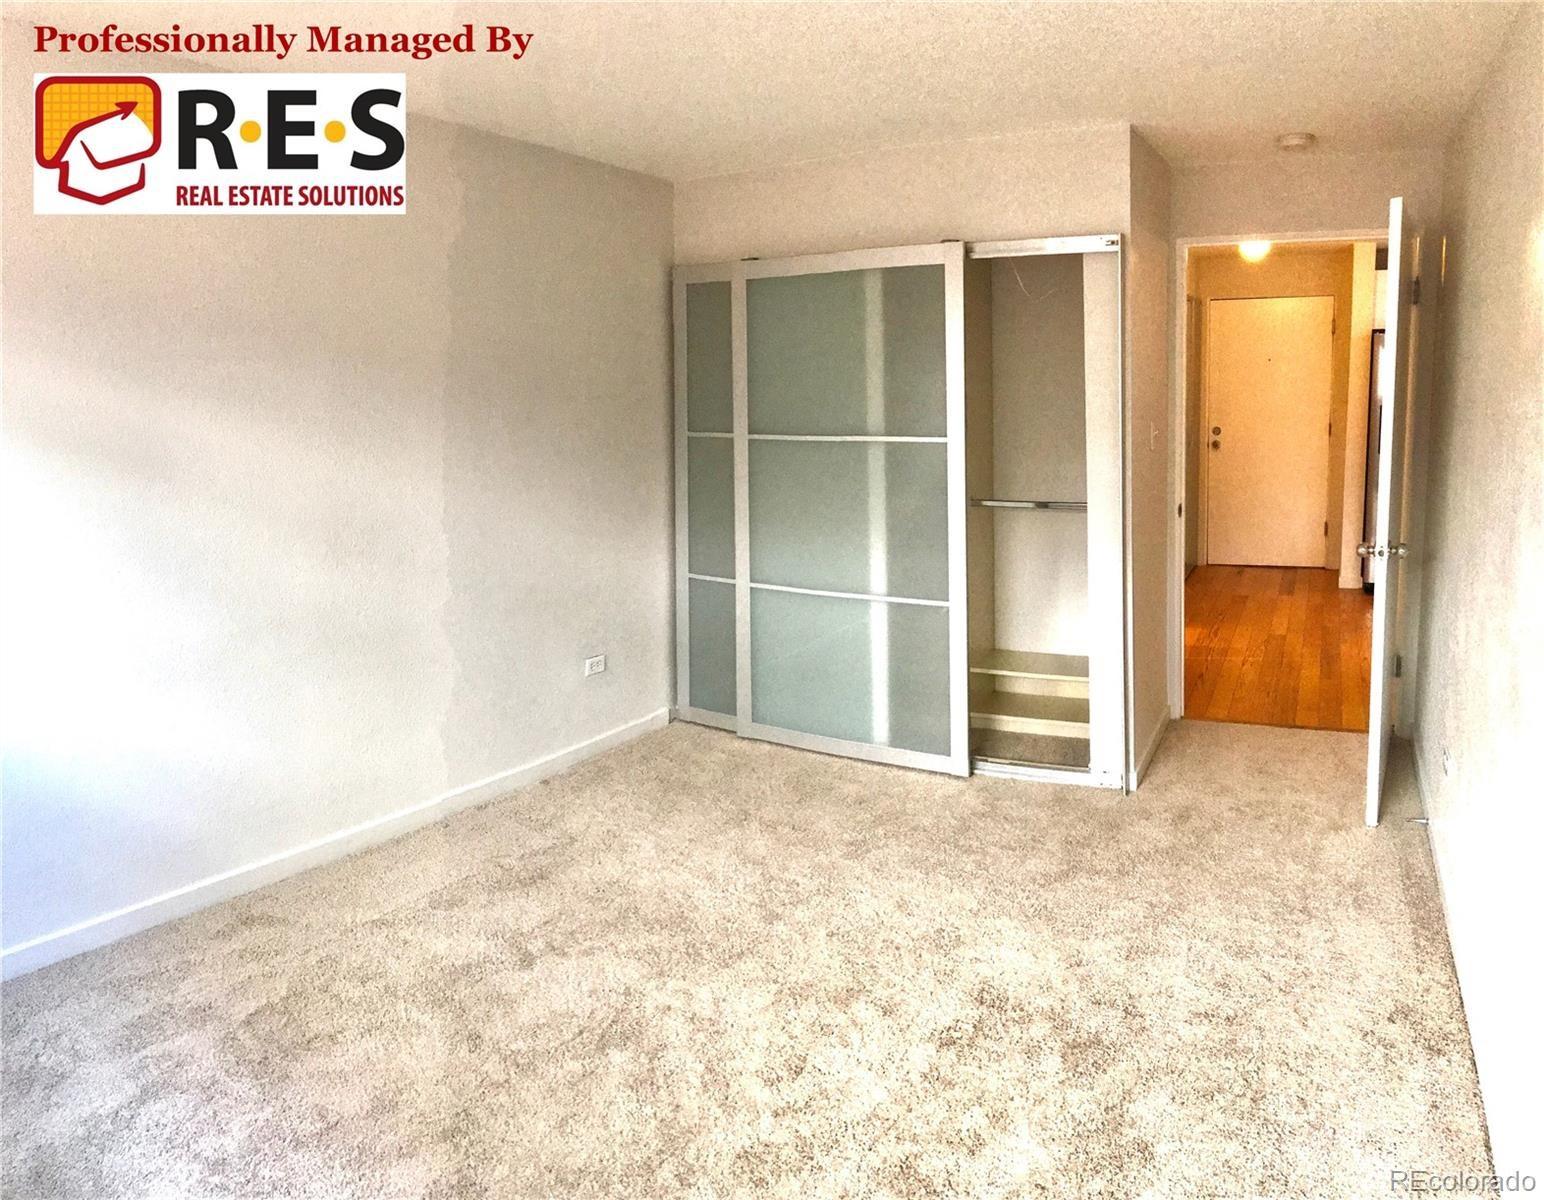 MLS# 9817838 - 7 - 75 N Emerson Street #103, Denver, CO 80218